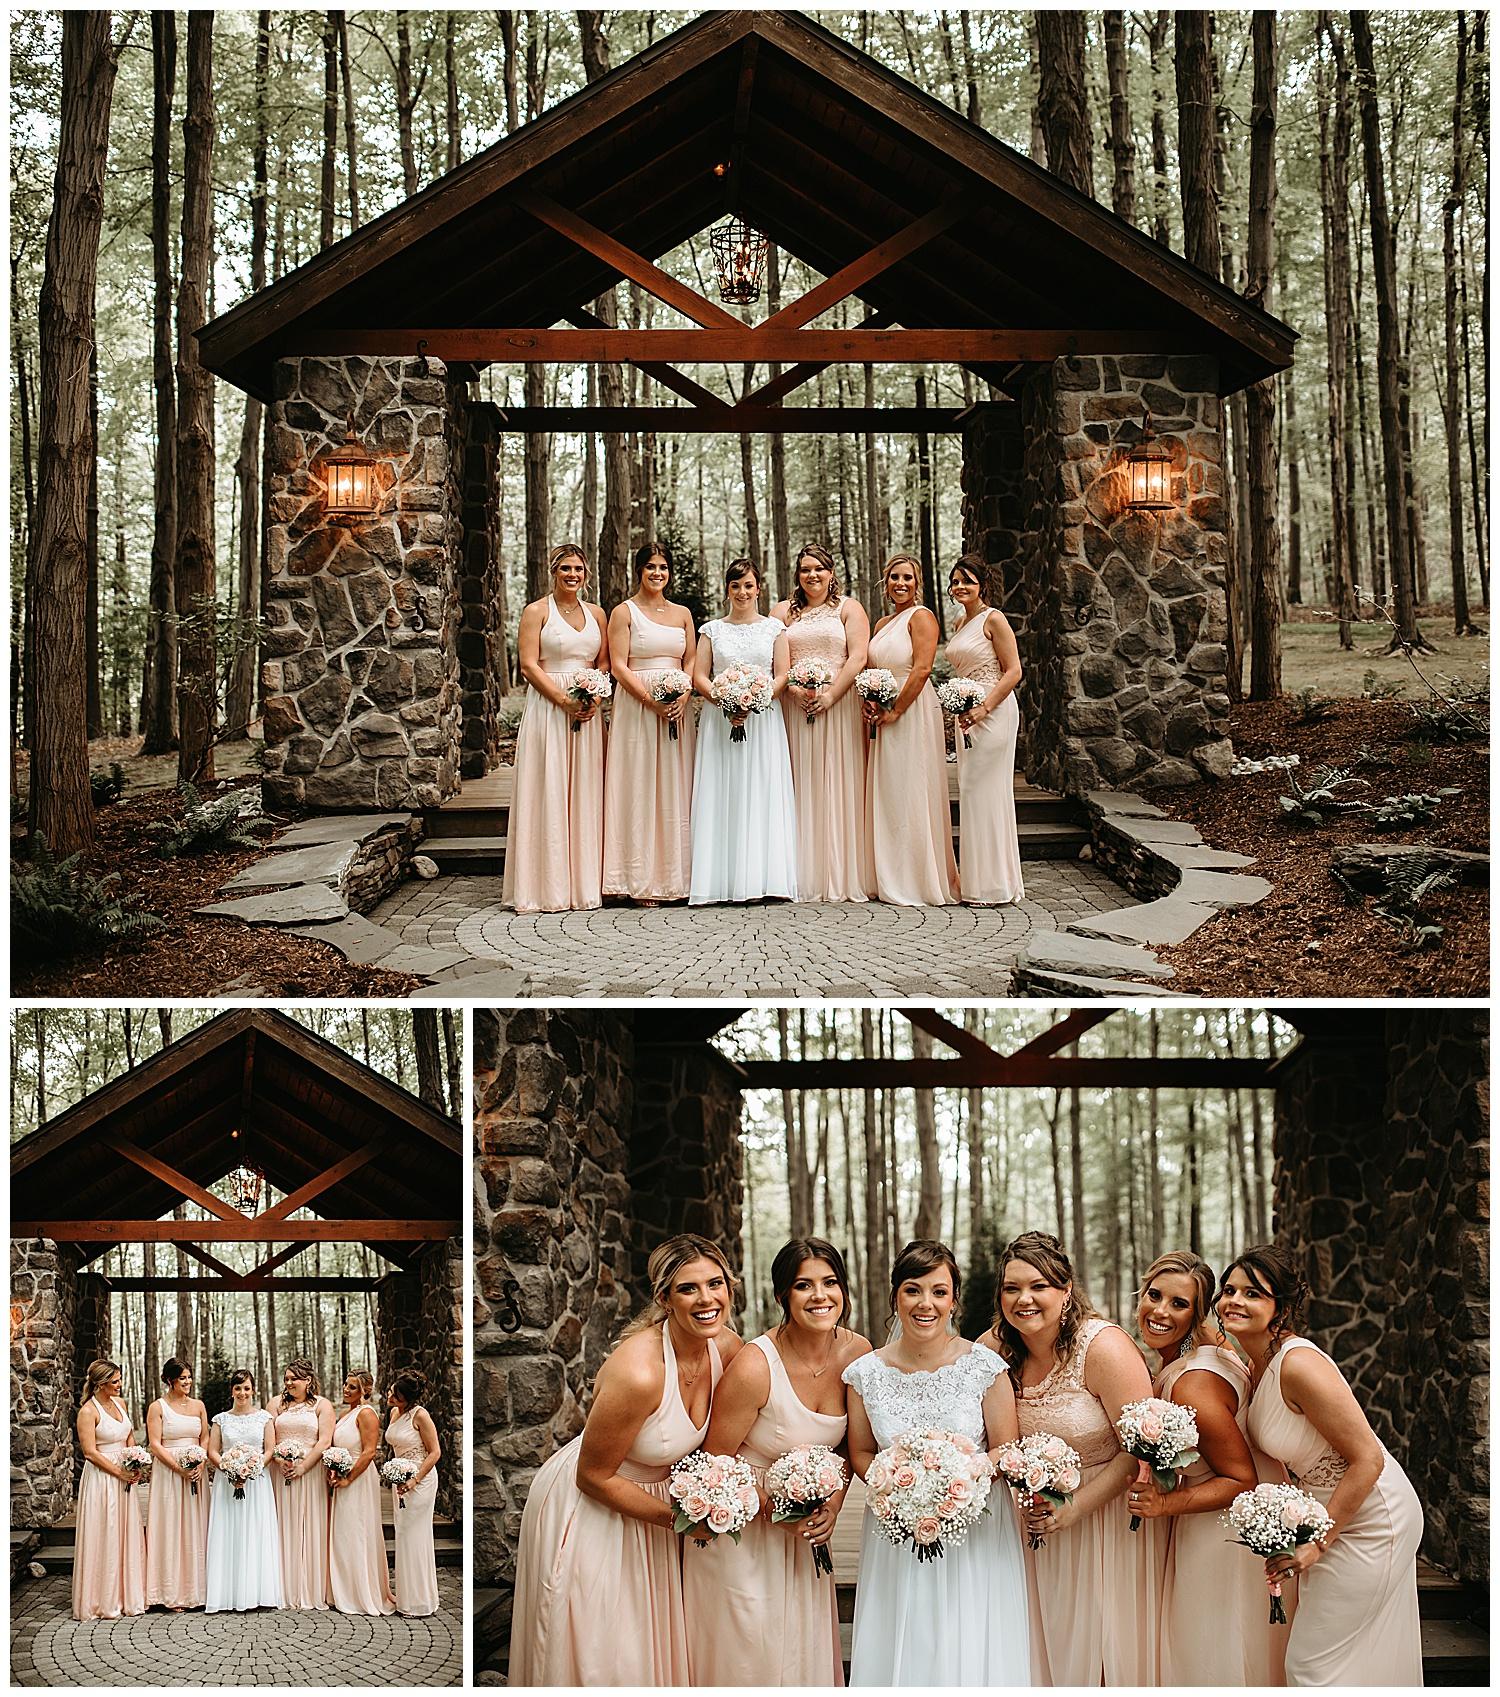 NEPA-Mount-Pocono-Wedding-Photographer-at-the-Stroudsmoor-Country-Inn-Stroudsburg-PA_0033.jpg